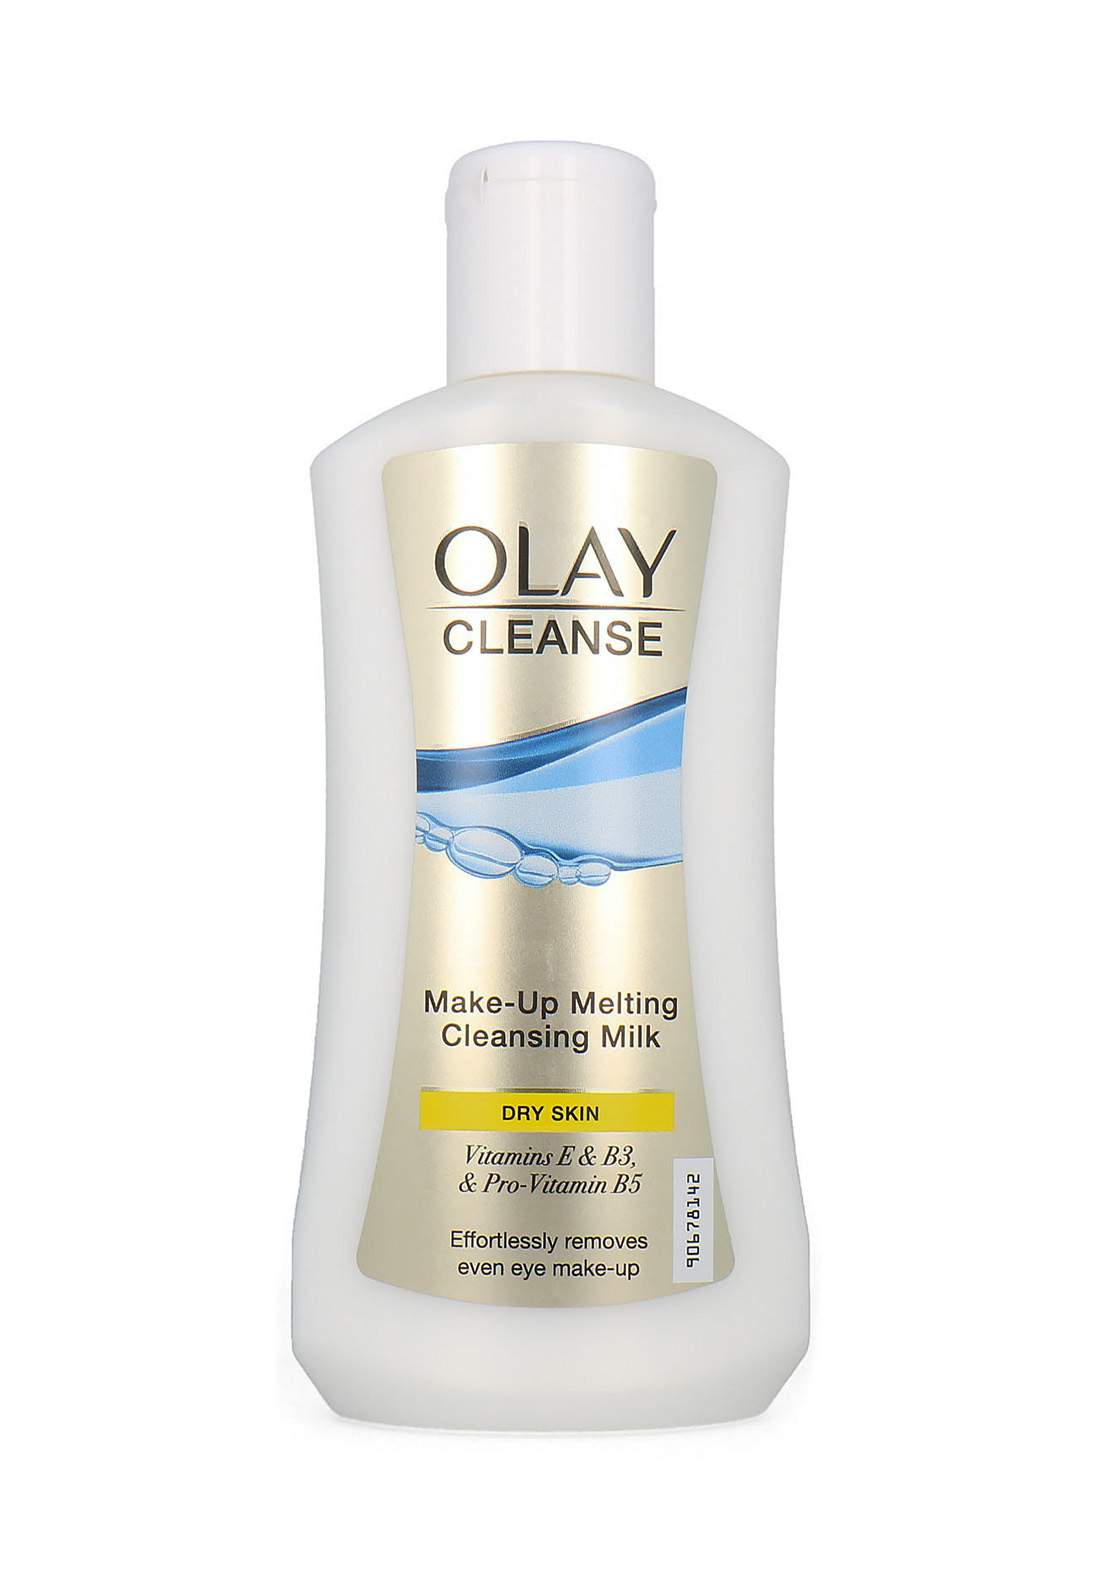 Olay (1116a007e0) Cleanse Make-Up Melting Cleansing Milk - 200 Ml  مزيل للمكياج